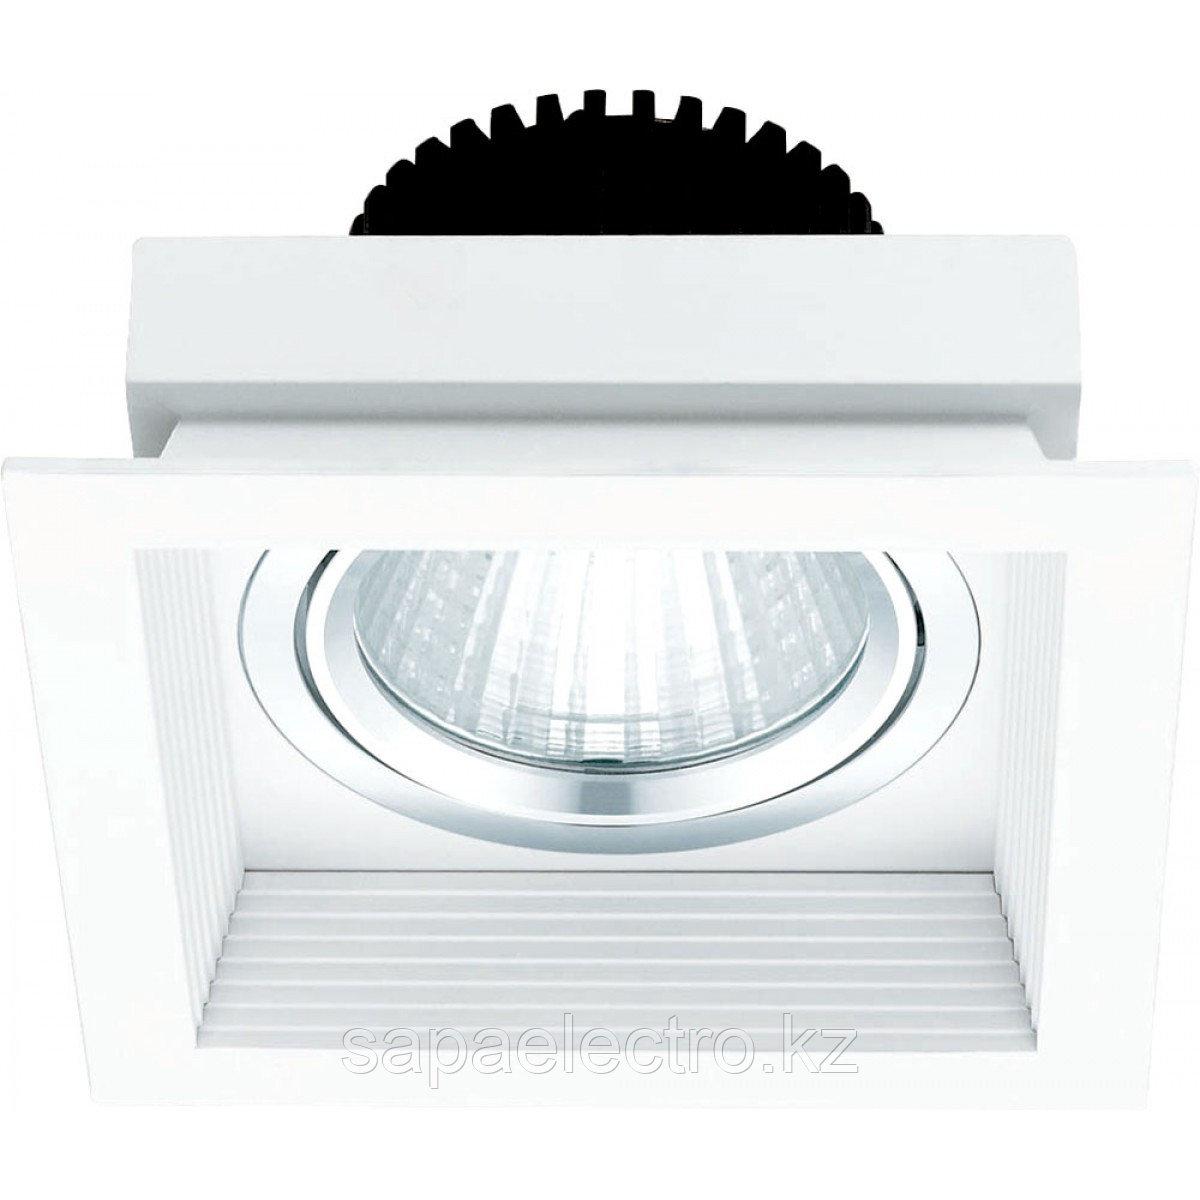 Свет-к DOWNLIGHT LED RS-2112C-1 10W 5700K (TS)32шт